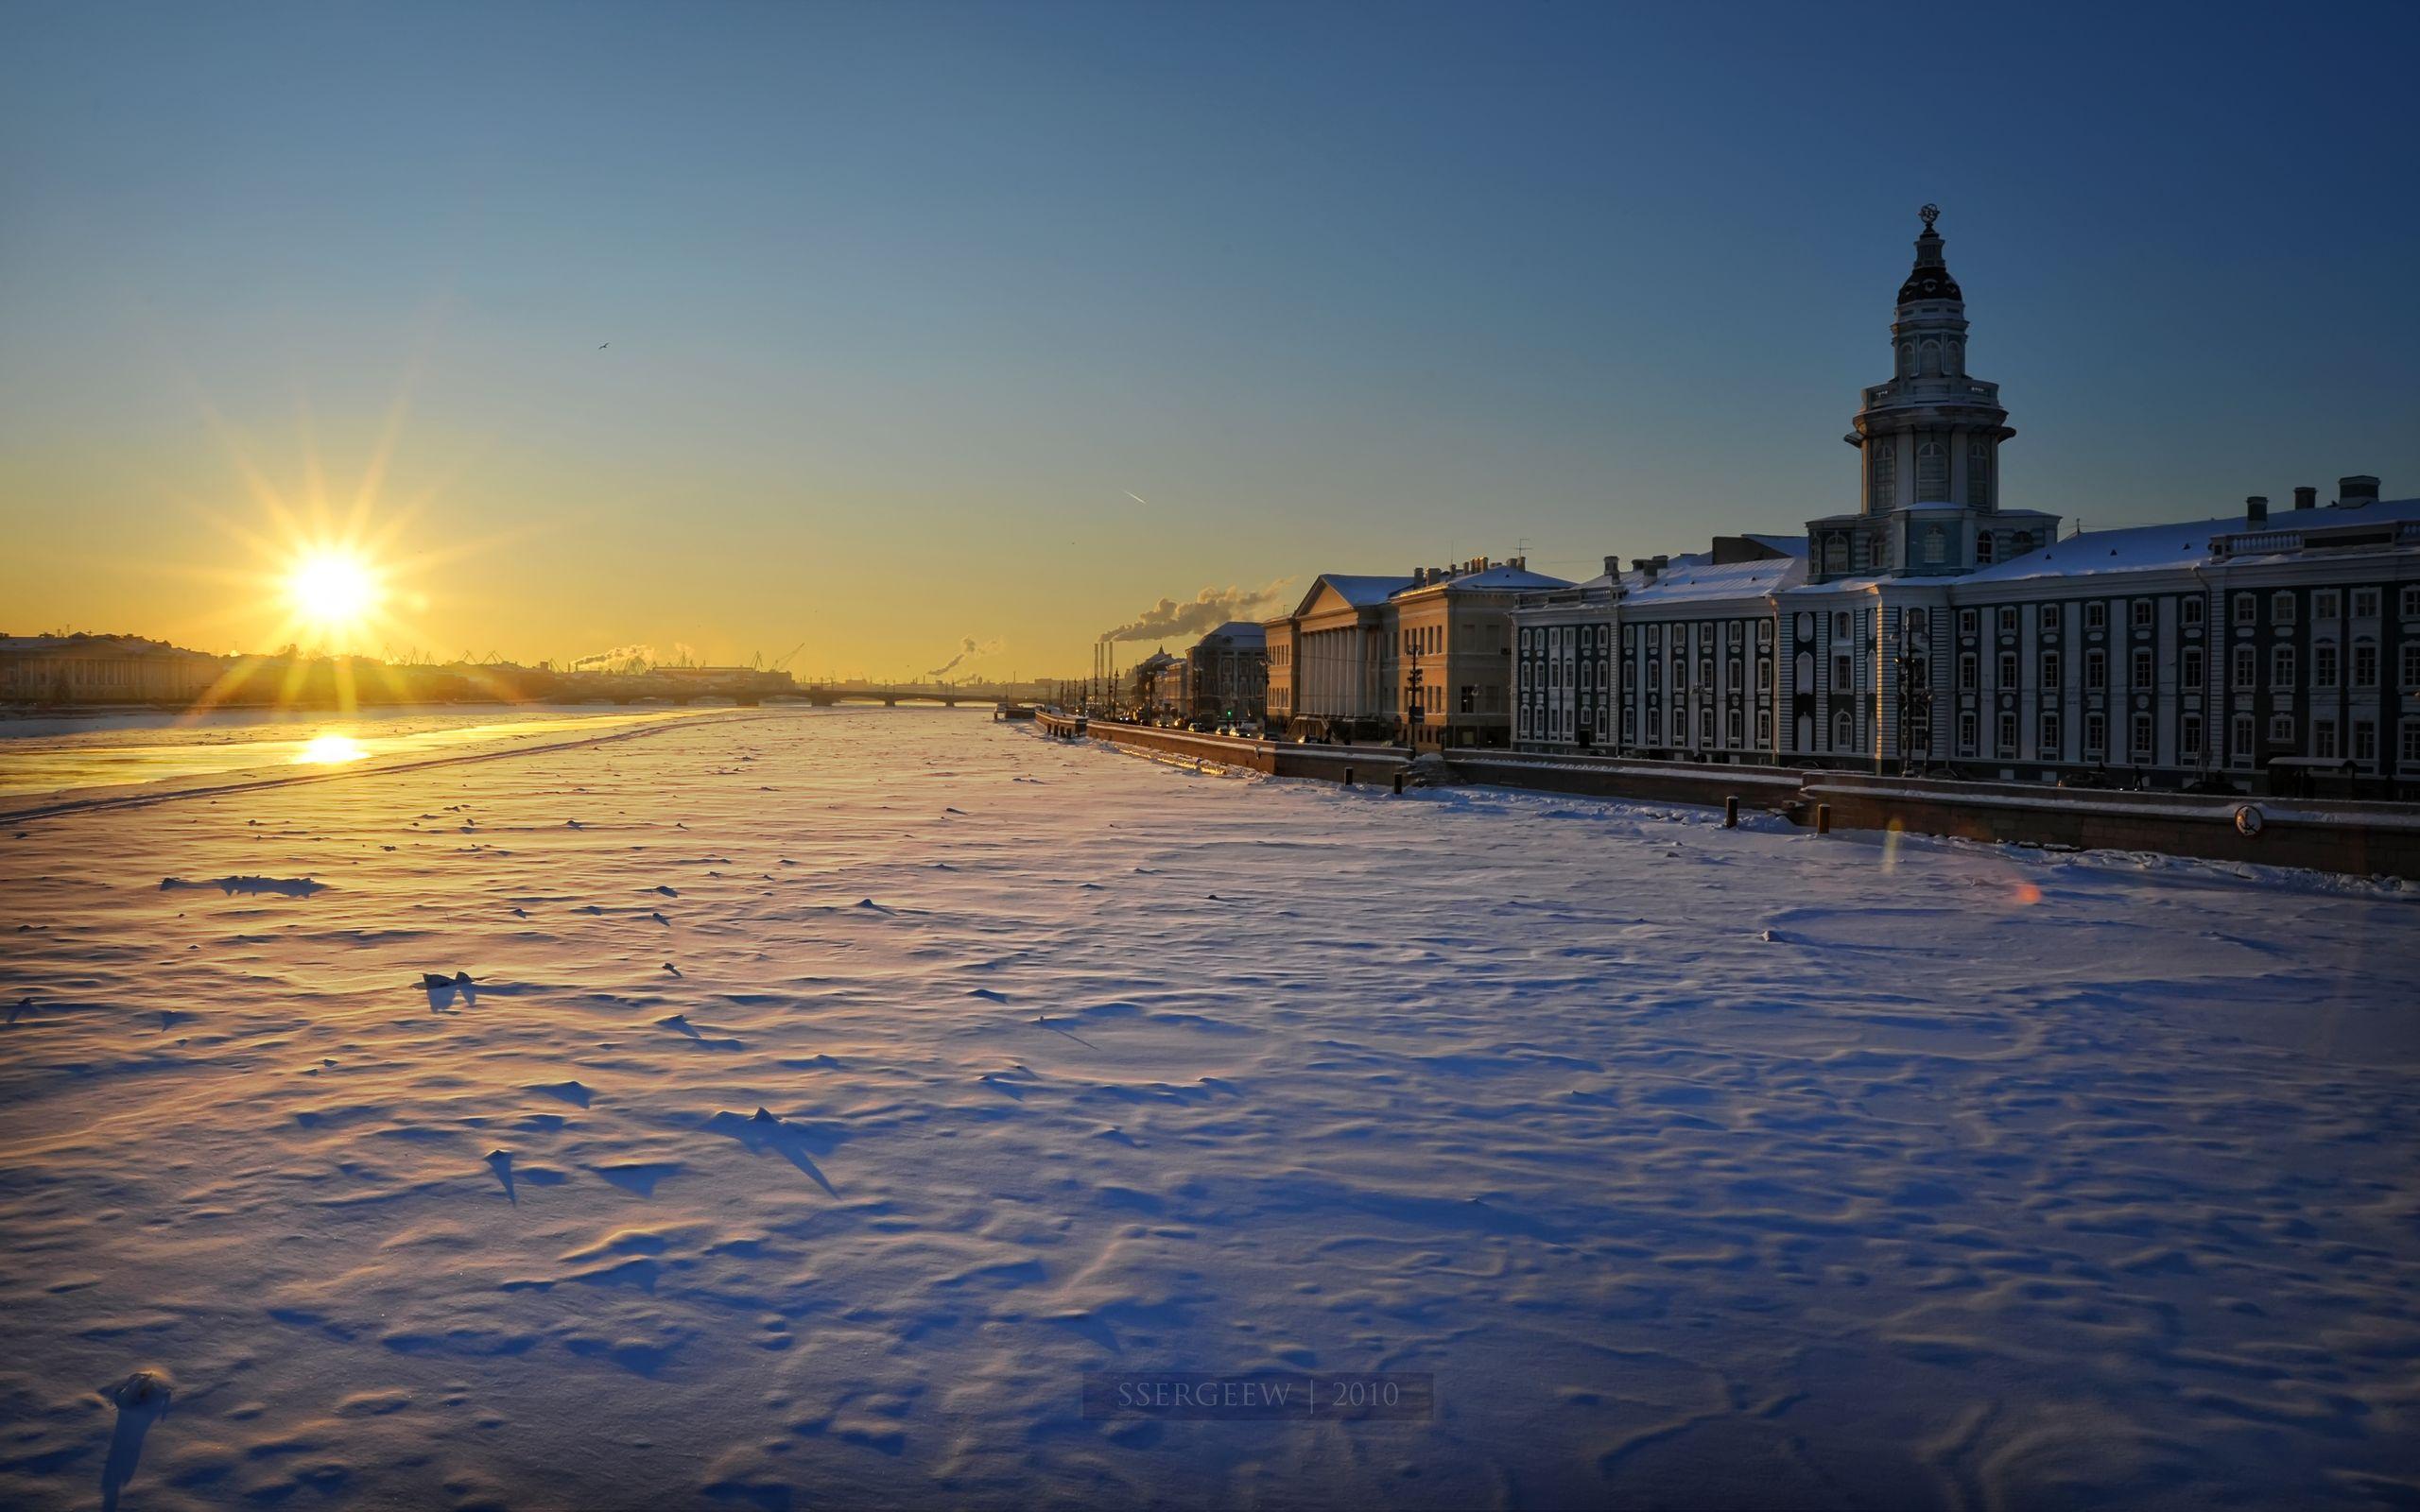 санкт петербург зимой